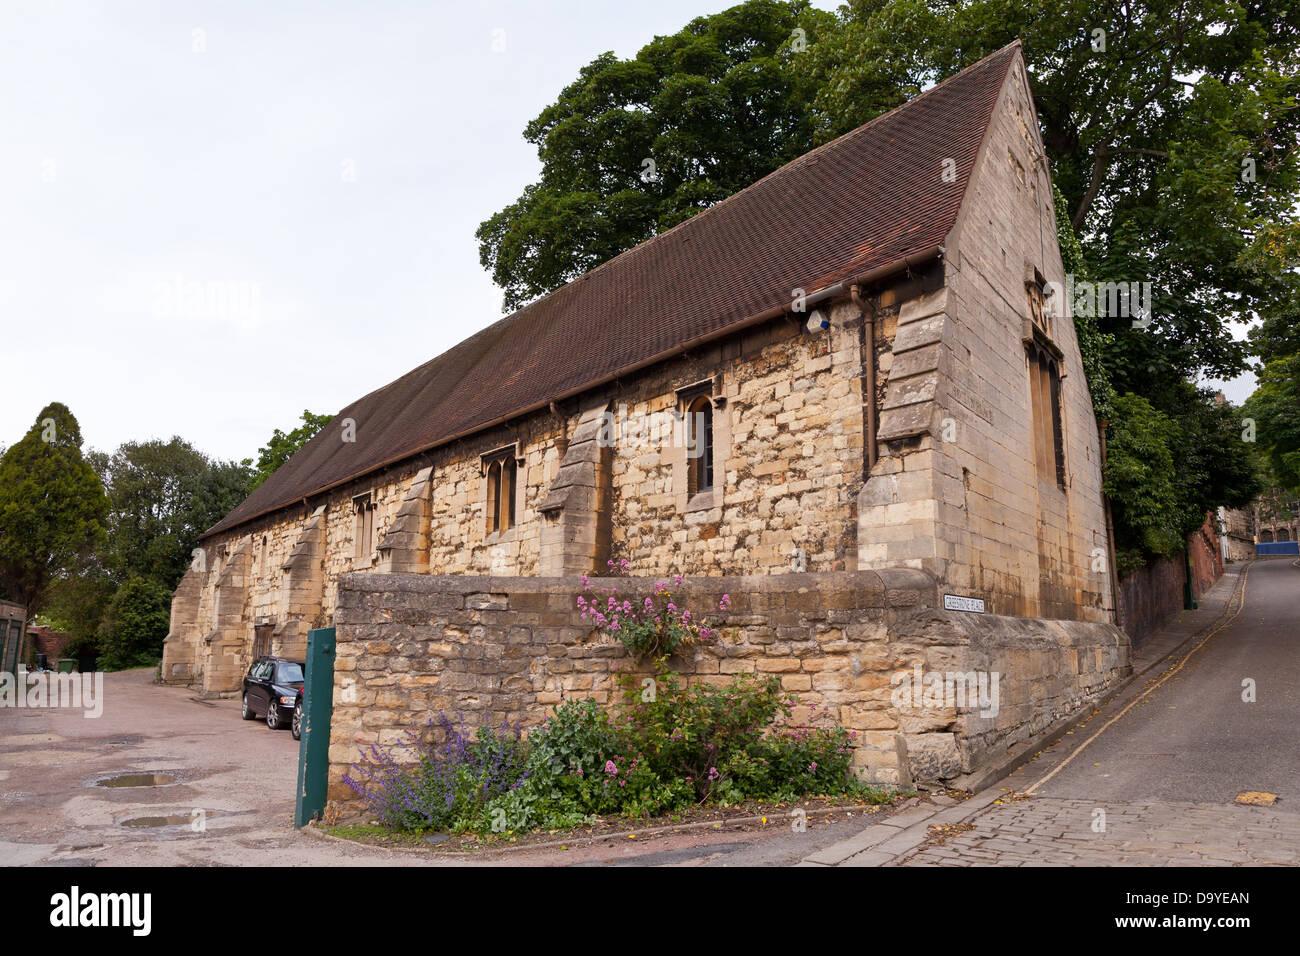 Lincoln - Tithe barn; Lincoln, Lincolnshire, UK, Europe - Stock Image